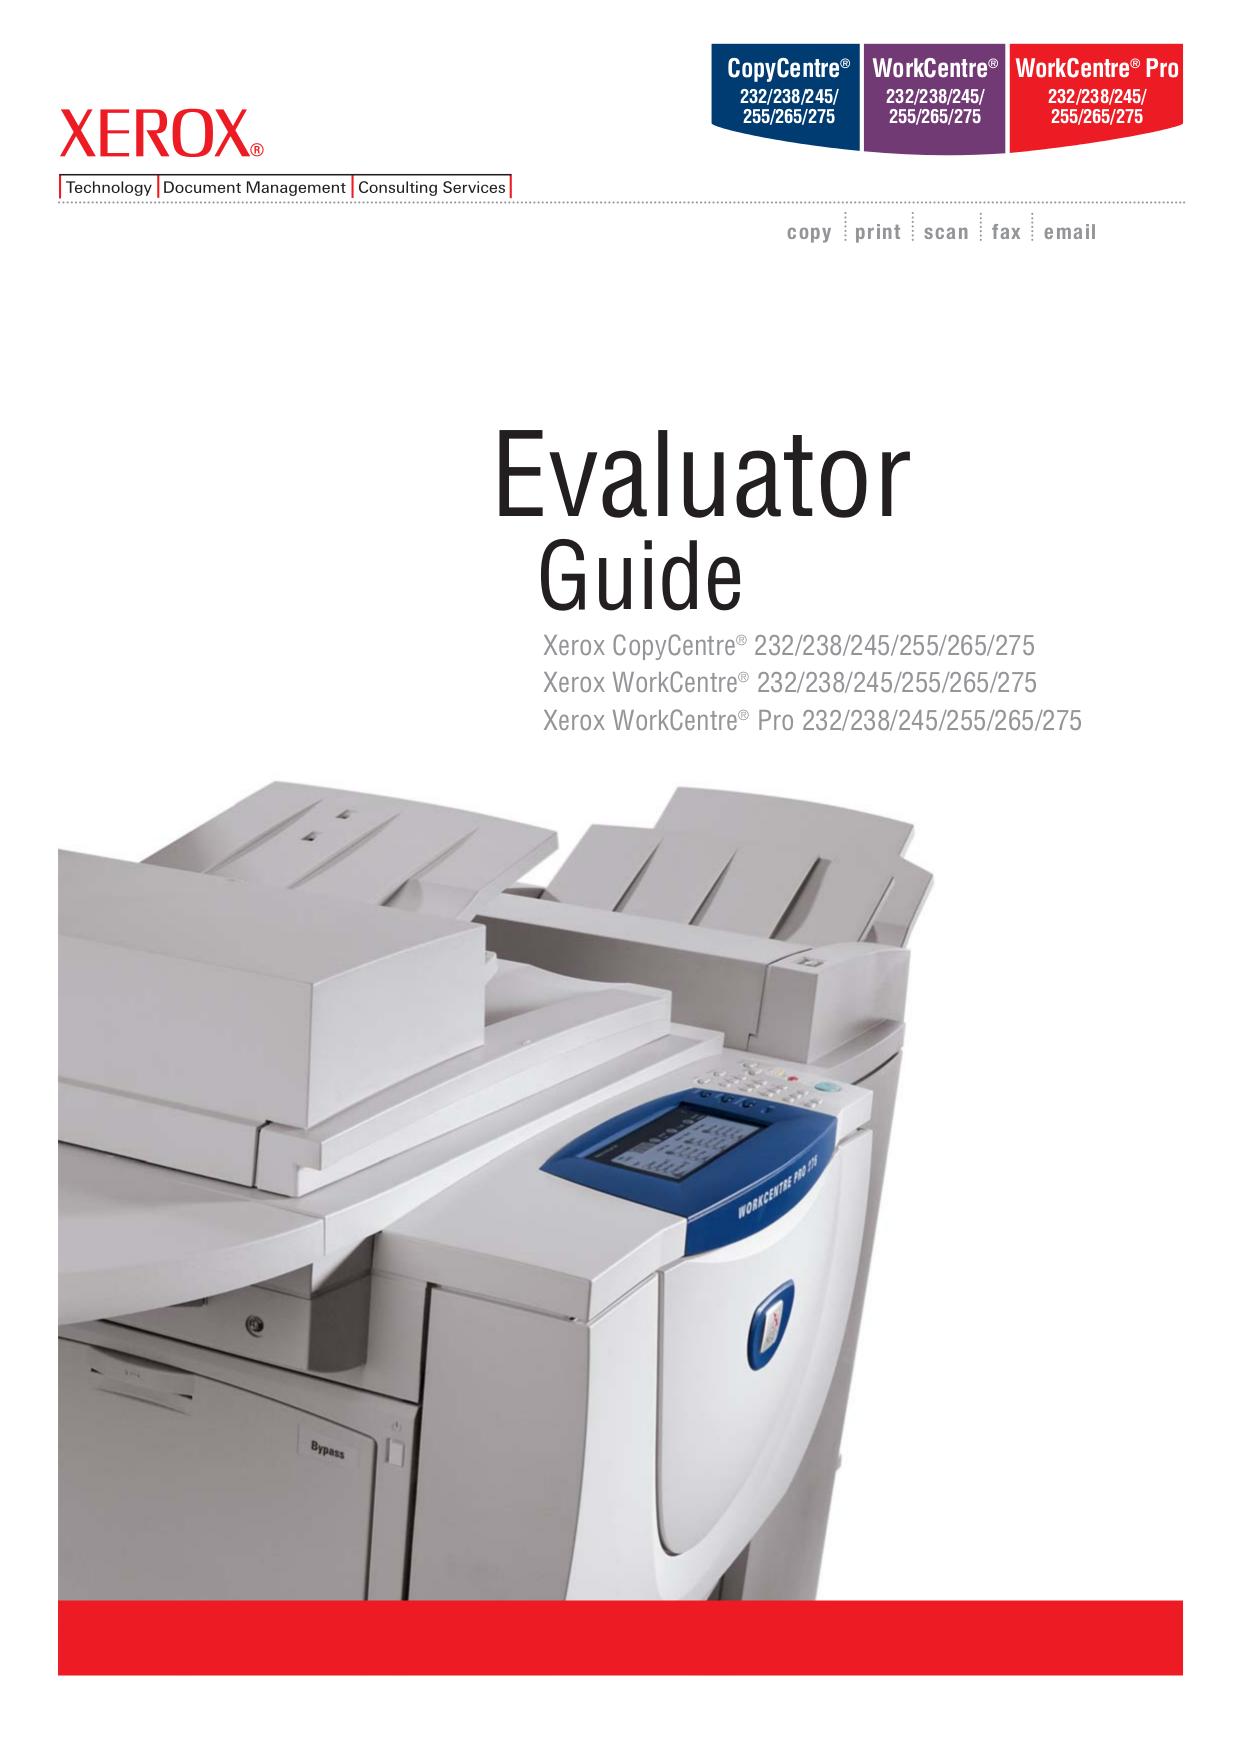 download free pdf for xerox workcentre 275 printer manual rh umlib com Xerox WorkCentre 5735 Xerox WorkCentre 7845